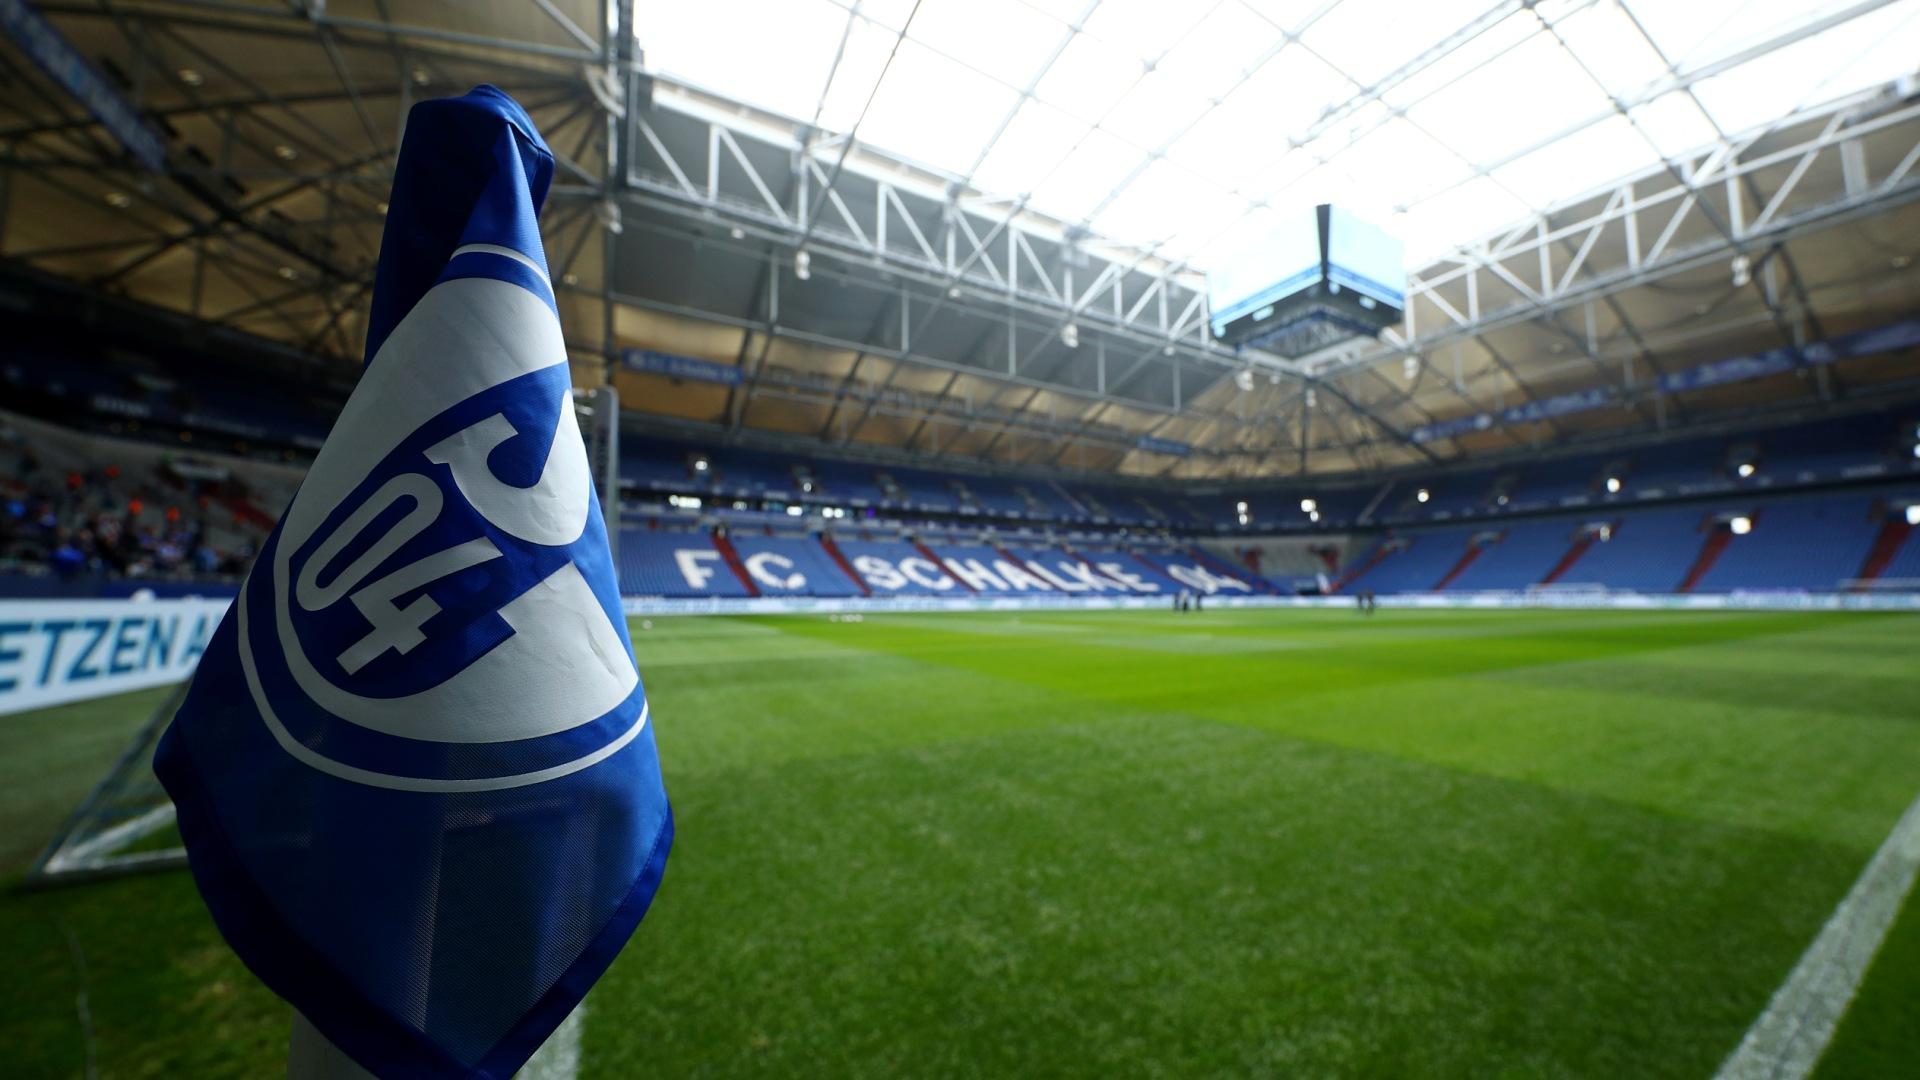 schalke 04 s04 vs union berlin heute kostenlos im live stream mit dem dazn gratismonat sehen goal com